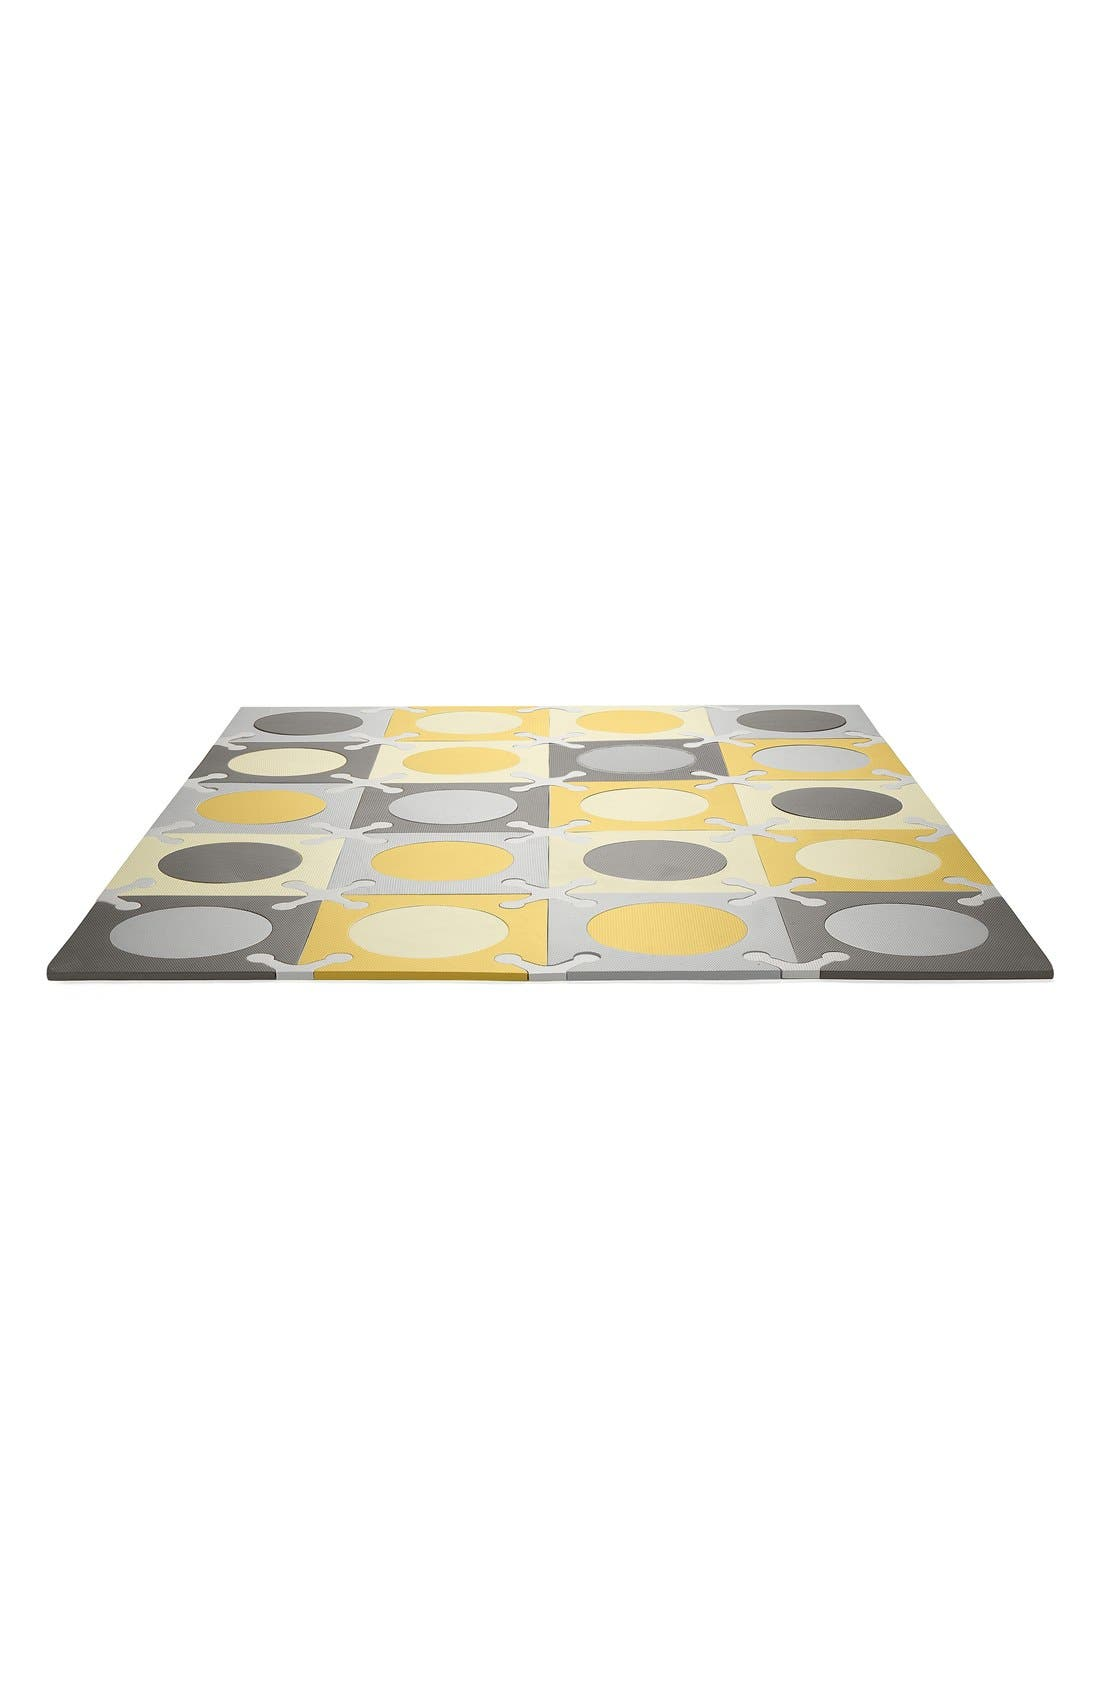 'Playspot' Floor Tiles,                             Main thumbnail 1, color,                             Gray/ Gold